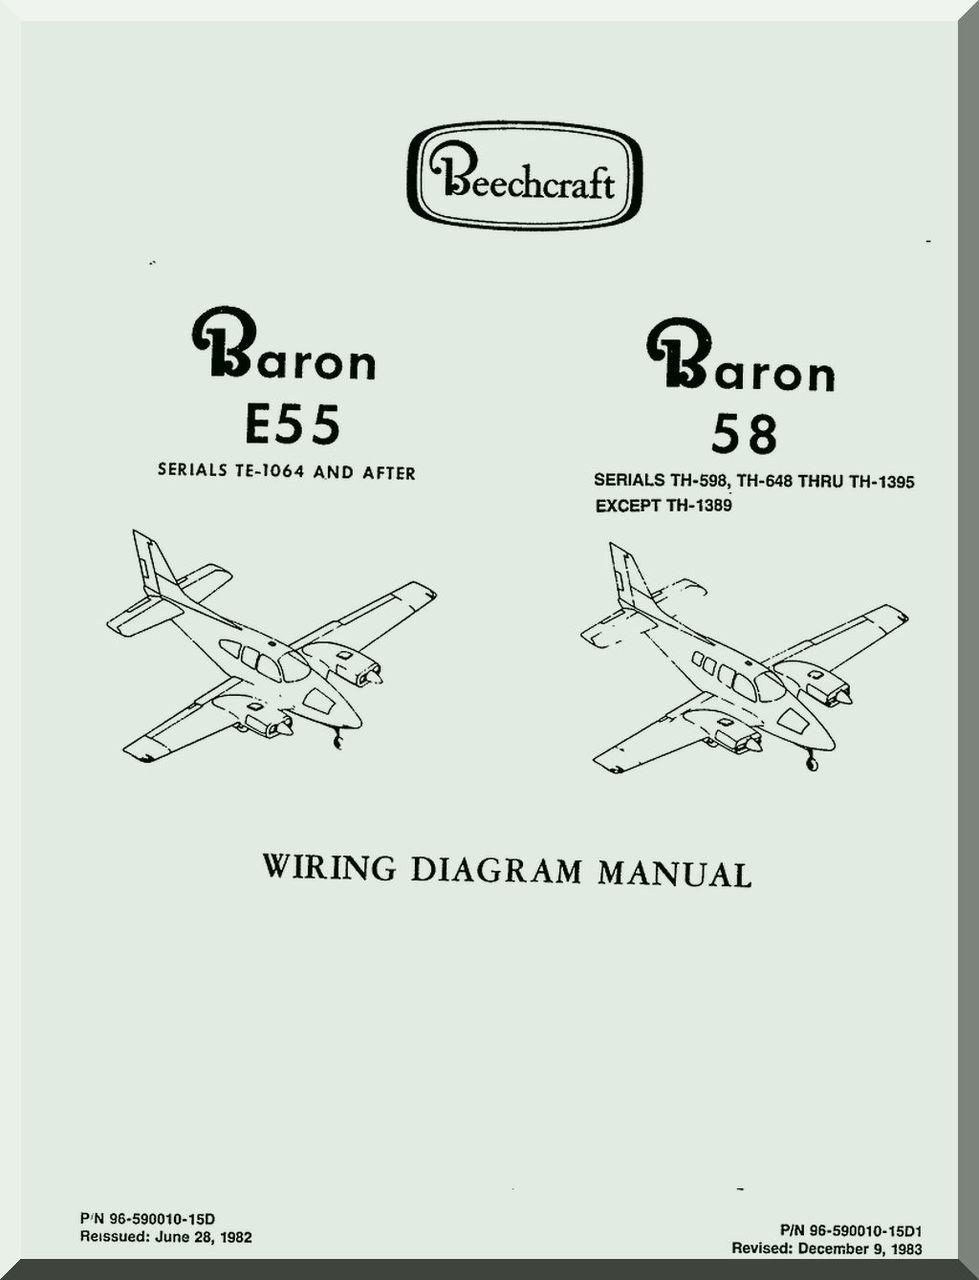 medium resolution of  aircraft wiring diagram manual price 14 85 image 1